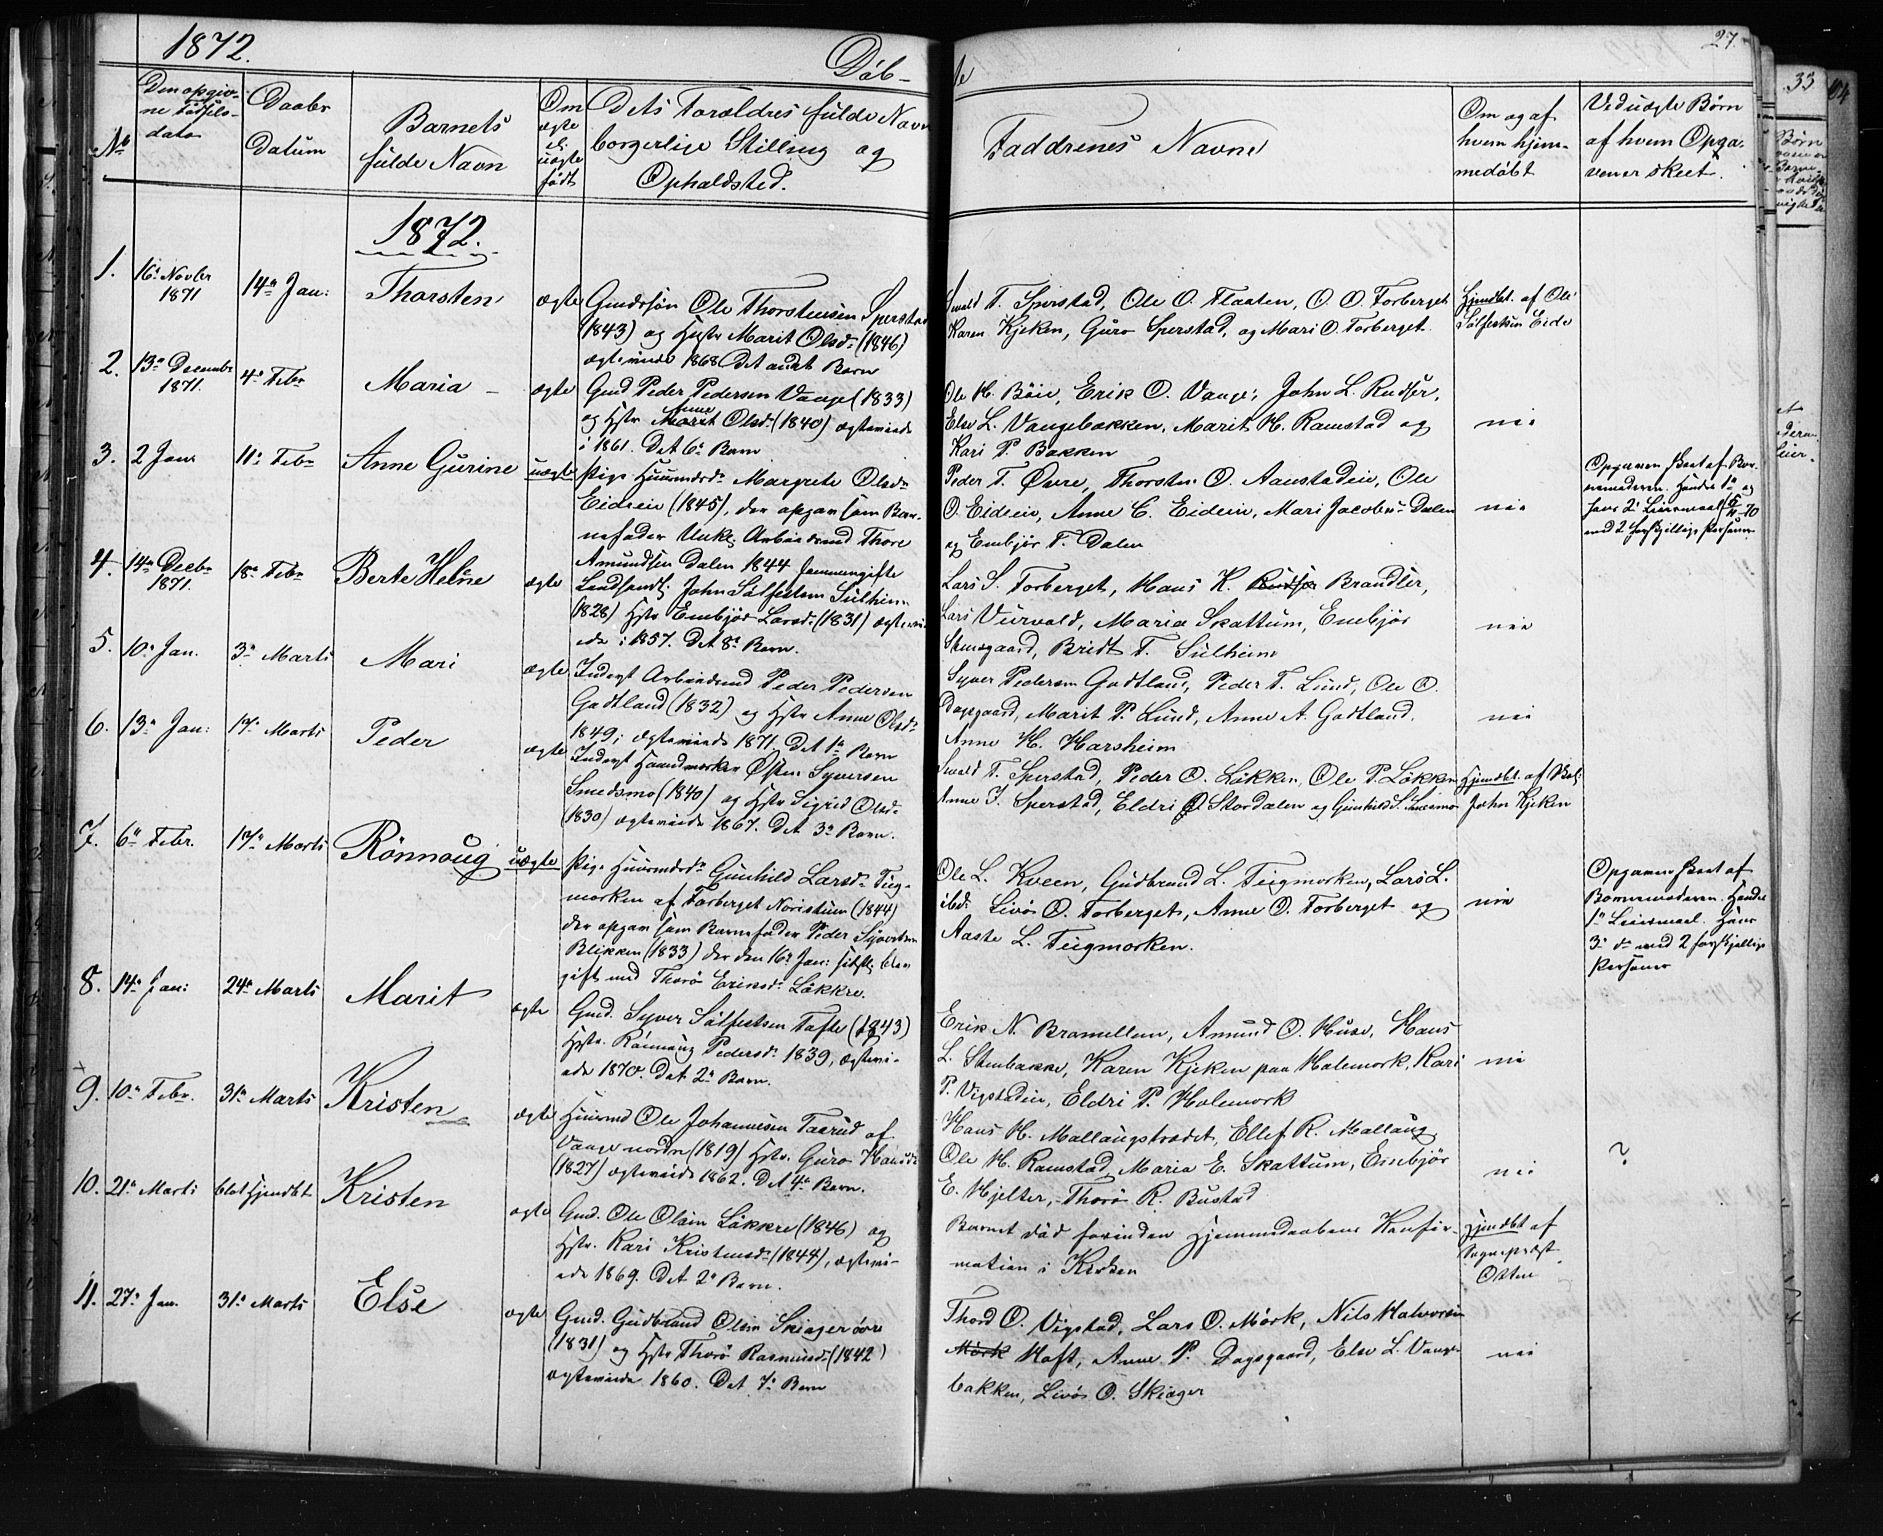 SAH, Skjåk prestekontor, Klokkerbok nr. 1, 1865-1893, s. 27